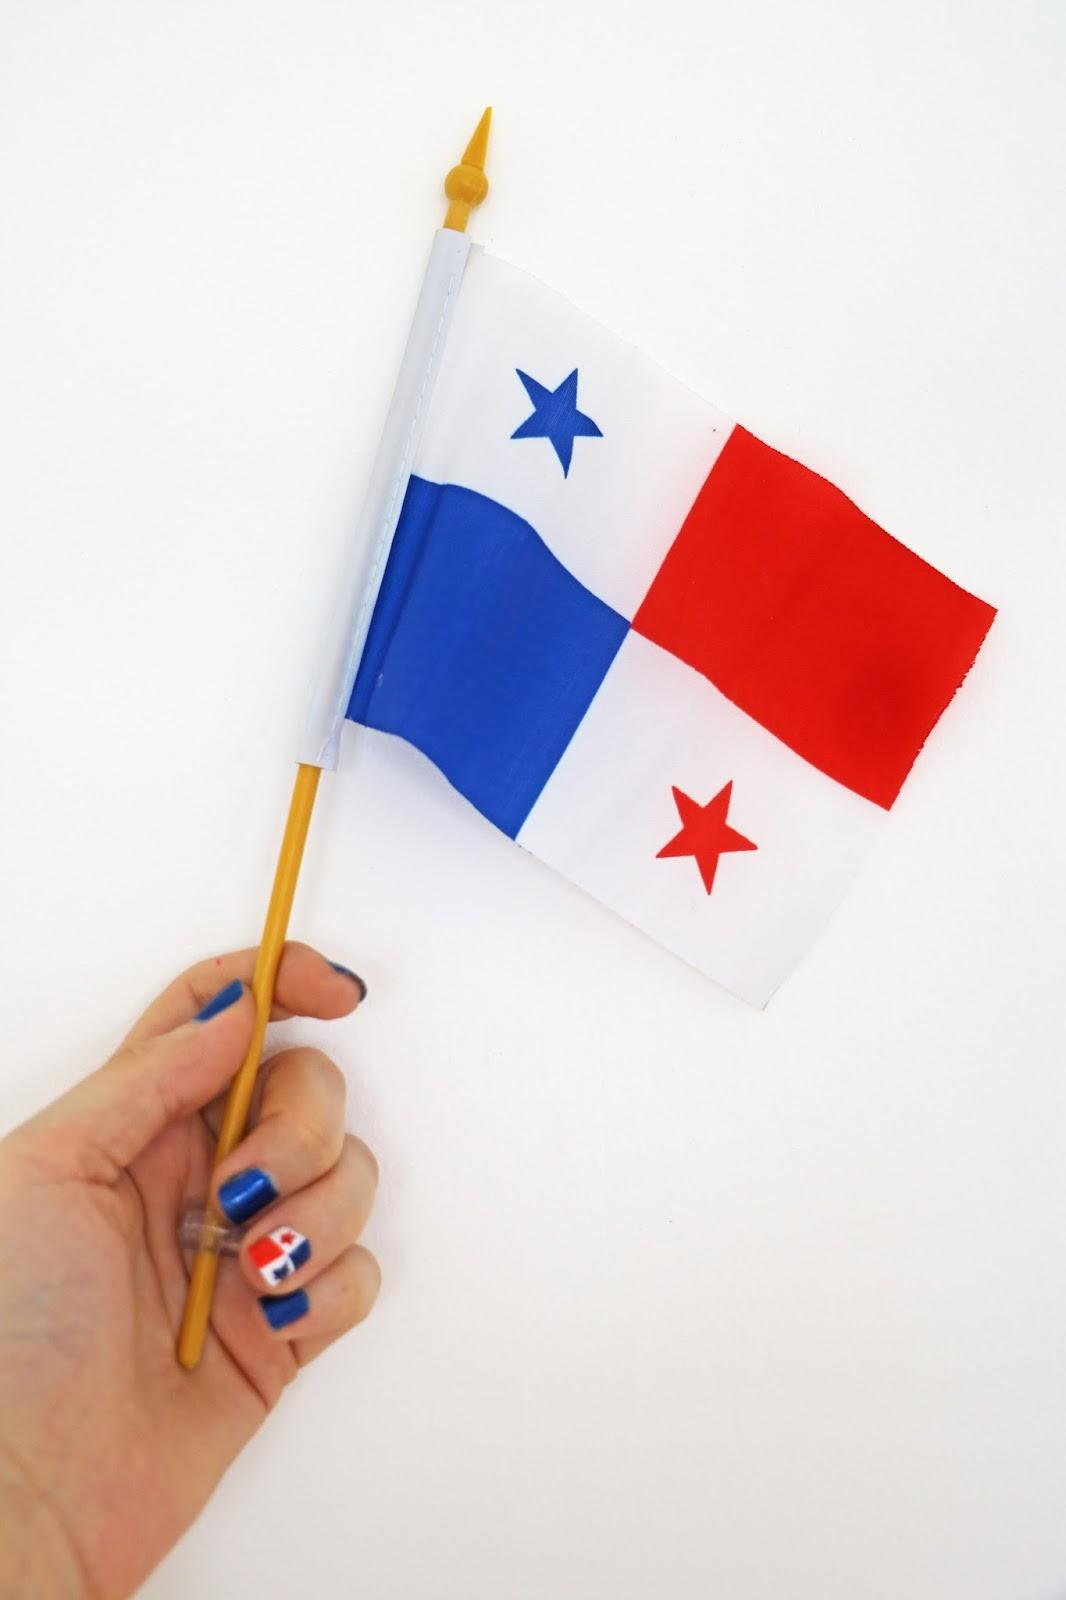 Panama flag nails